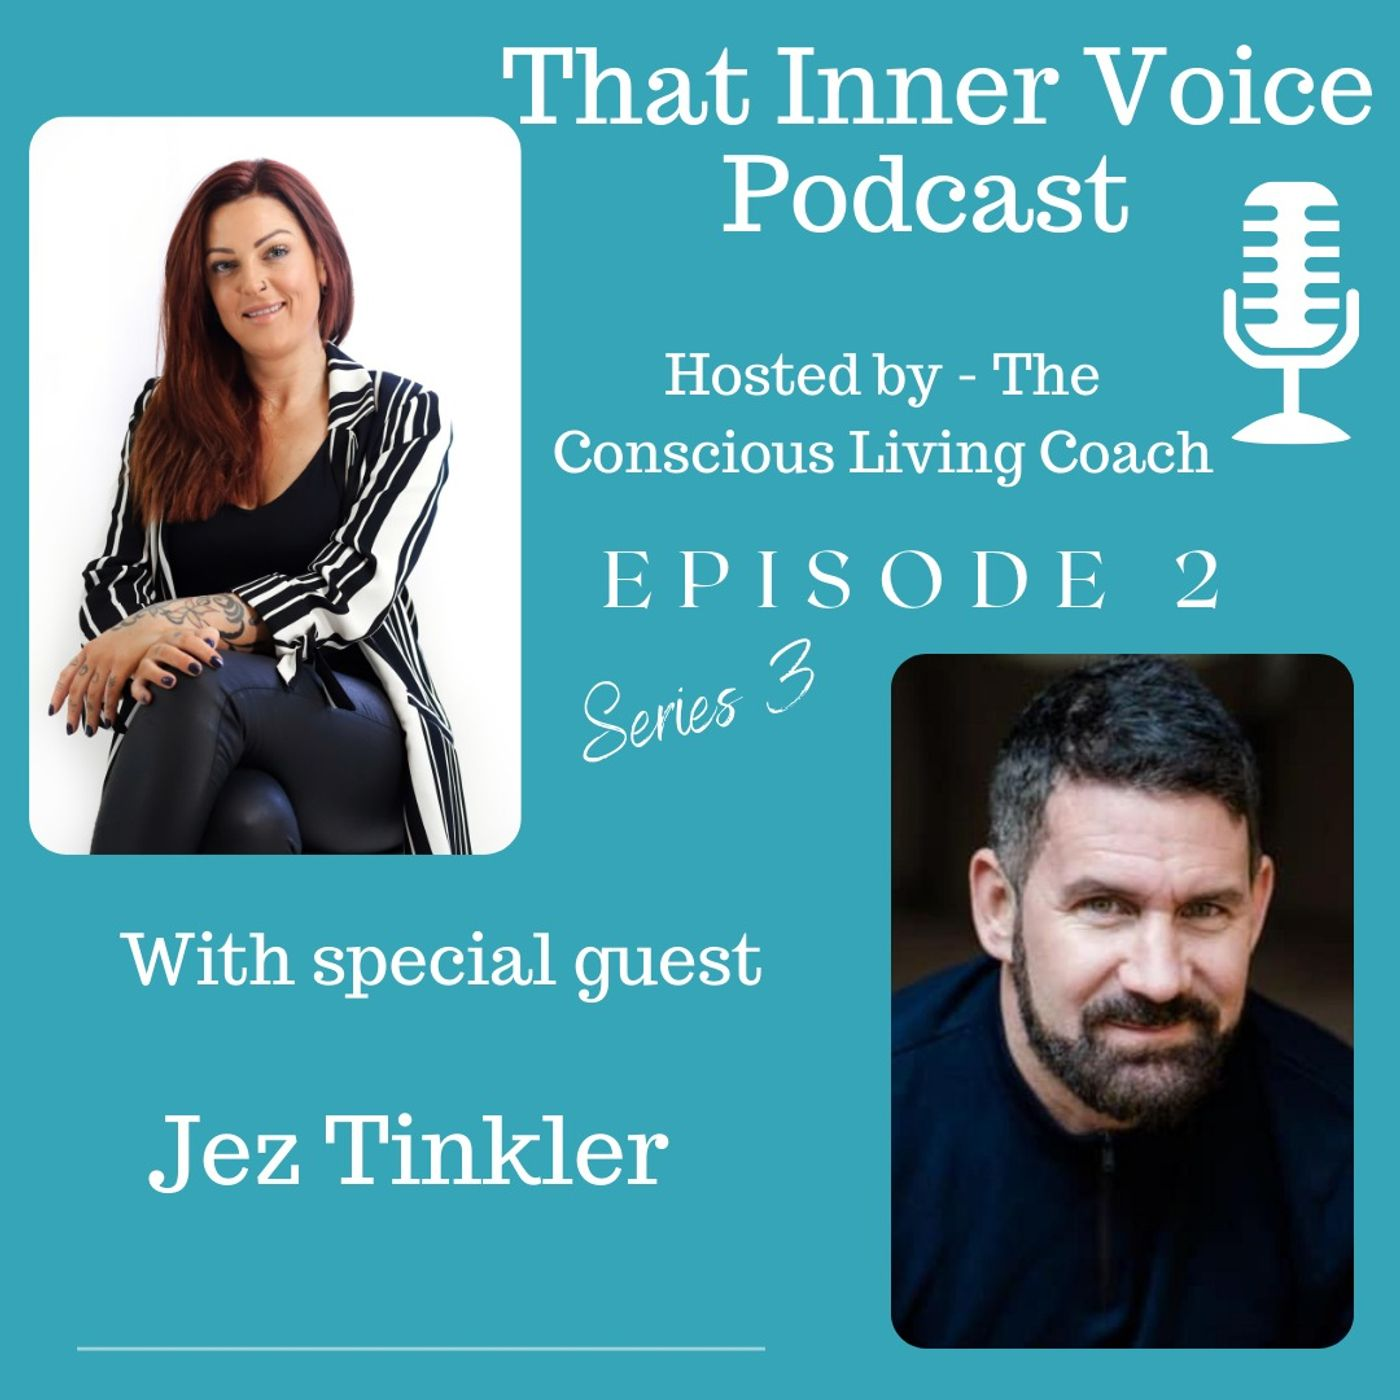 Speaking Truth with Jez Tinkler